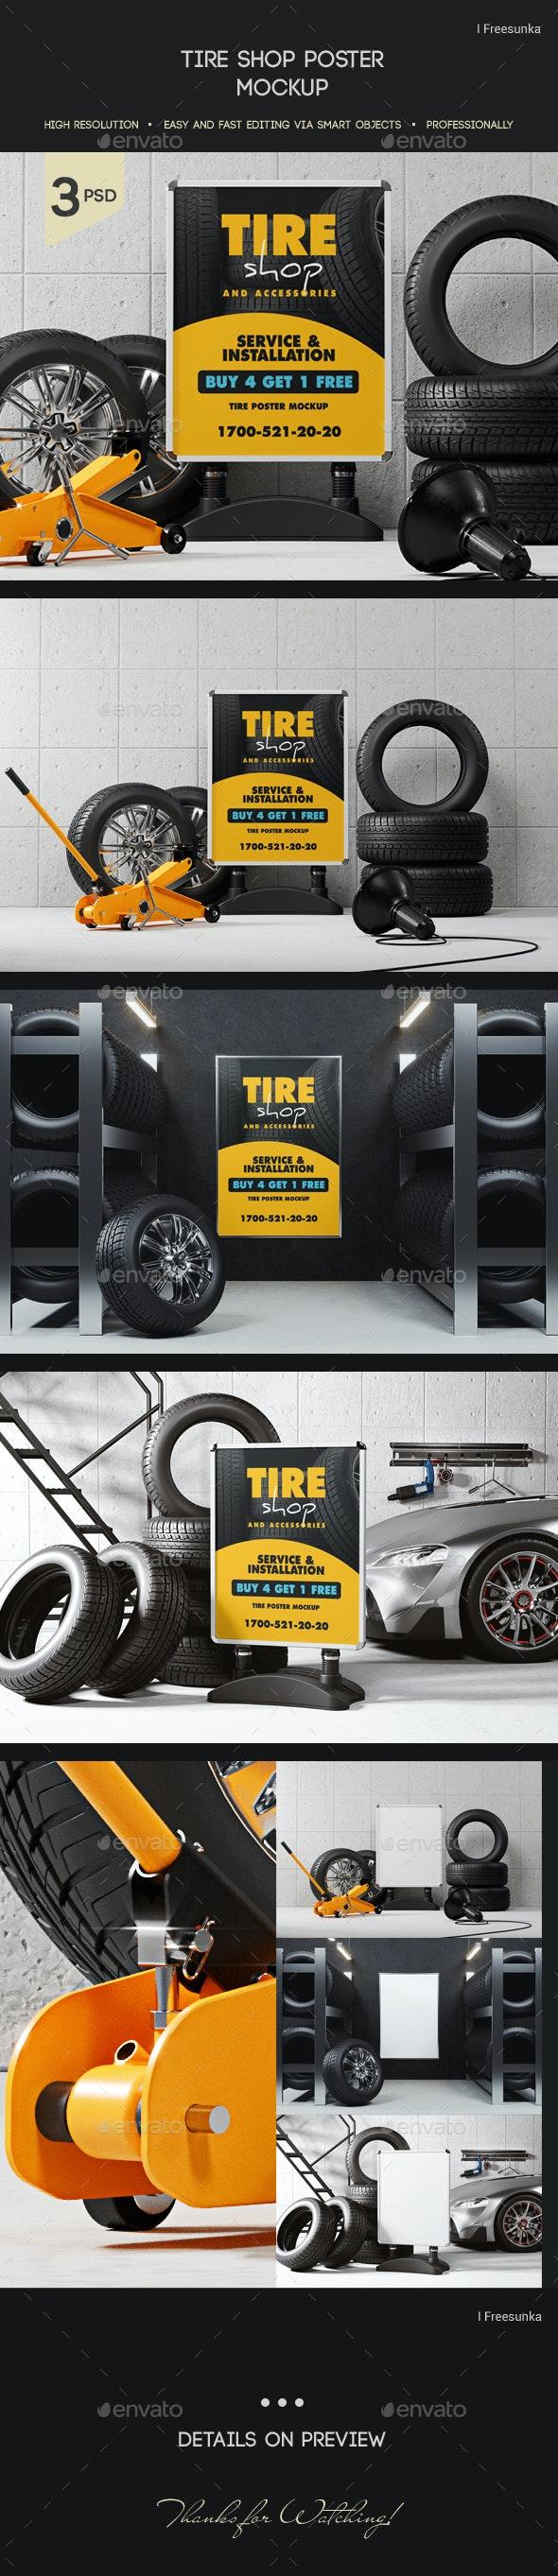 Tire Shop Poster Mockup - Posters Print